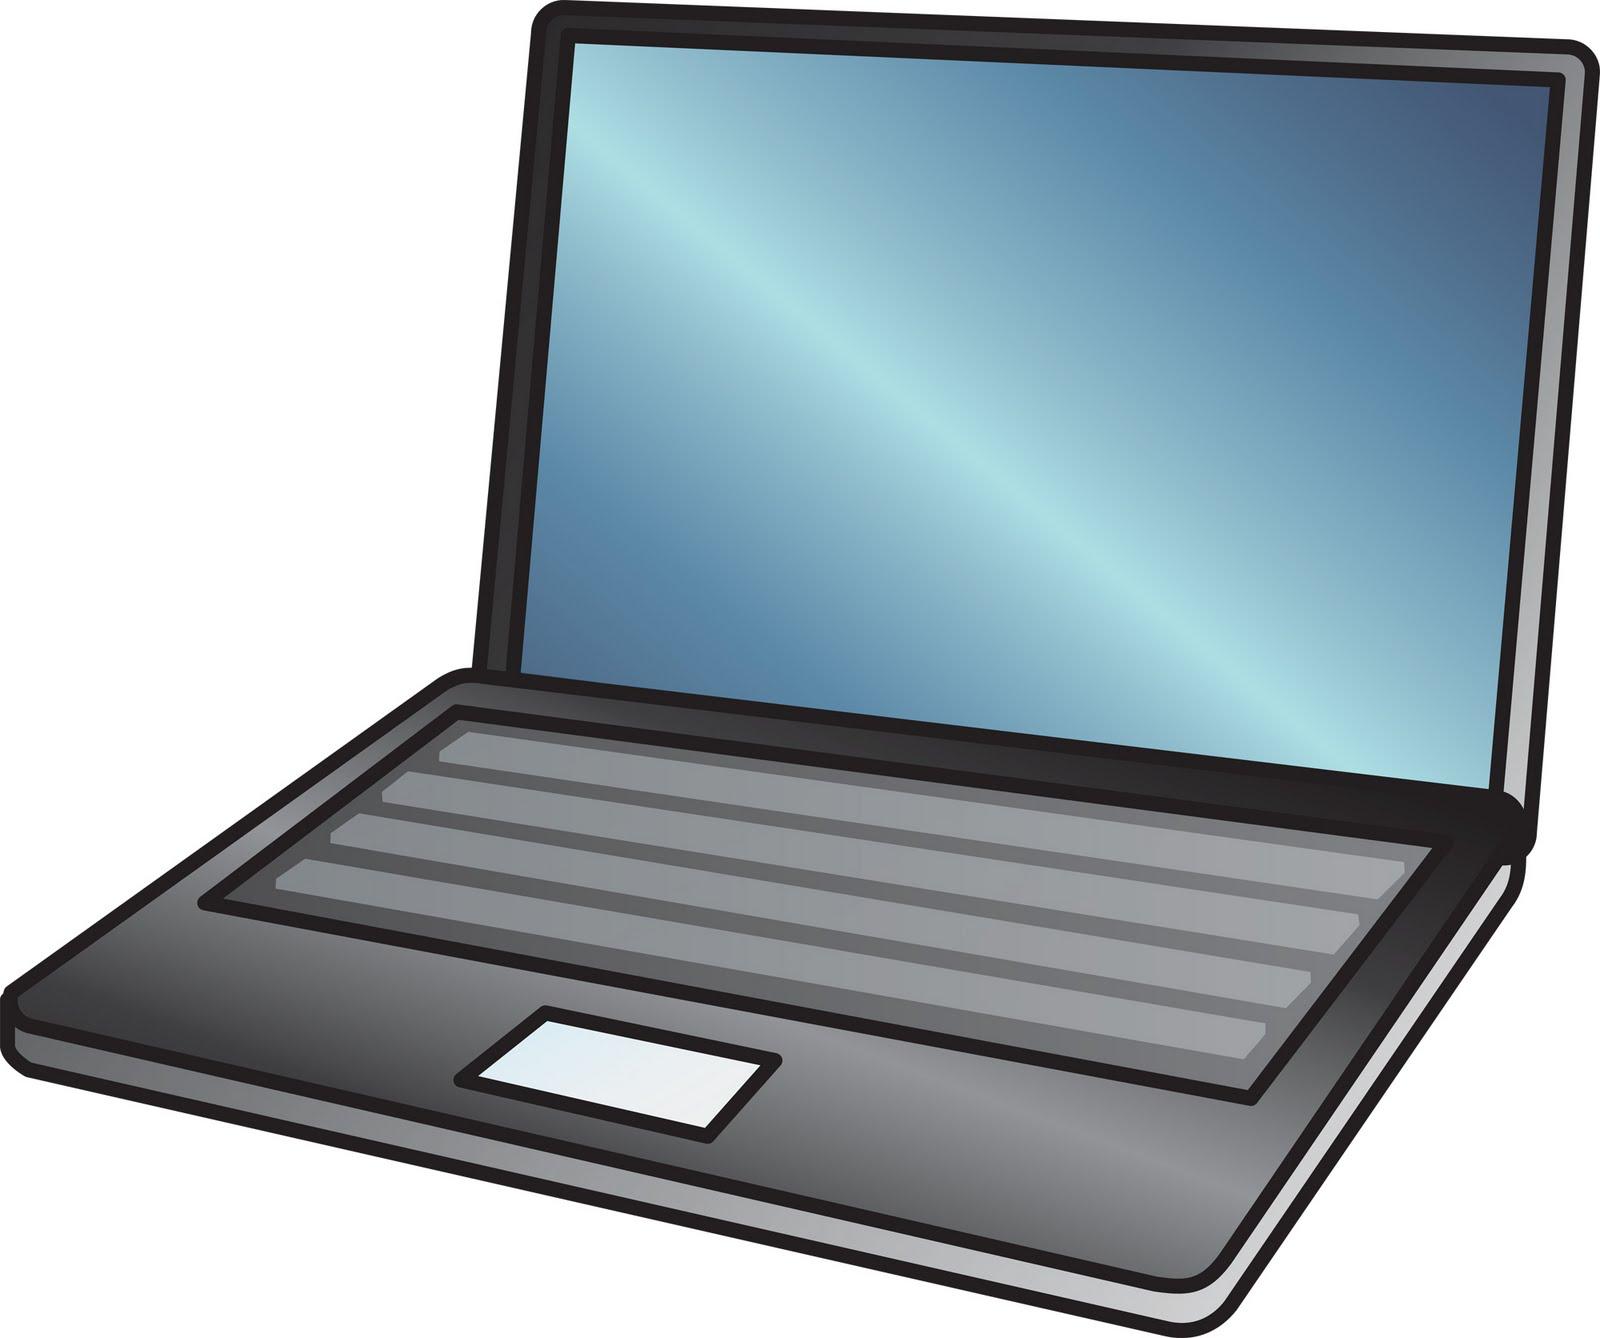 Laptop Computer Clipart Clipart Panda Free Clipart Images